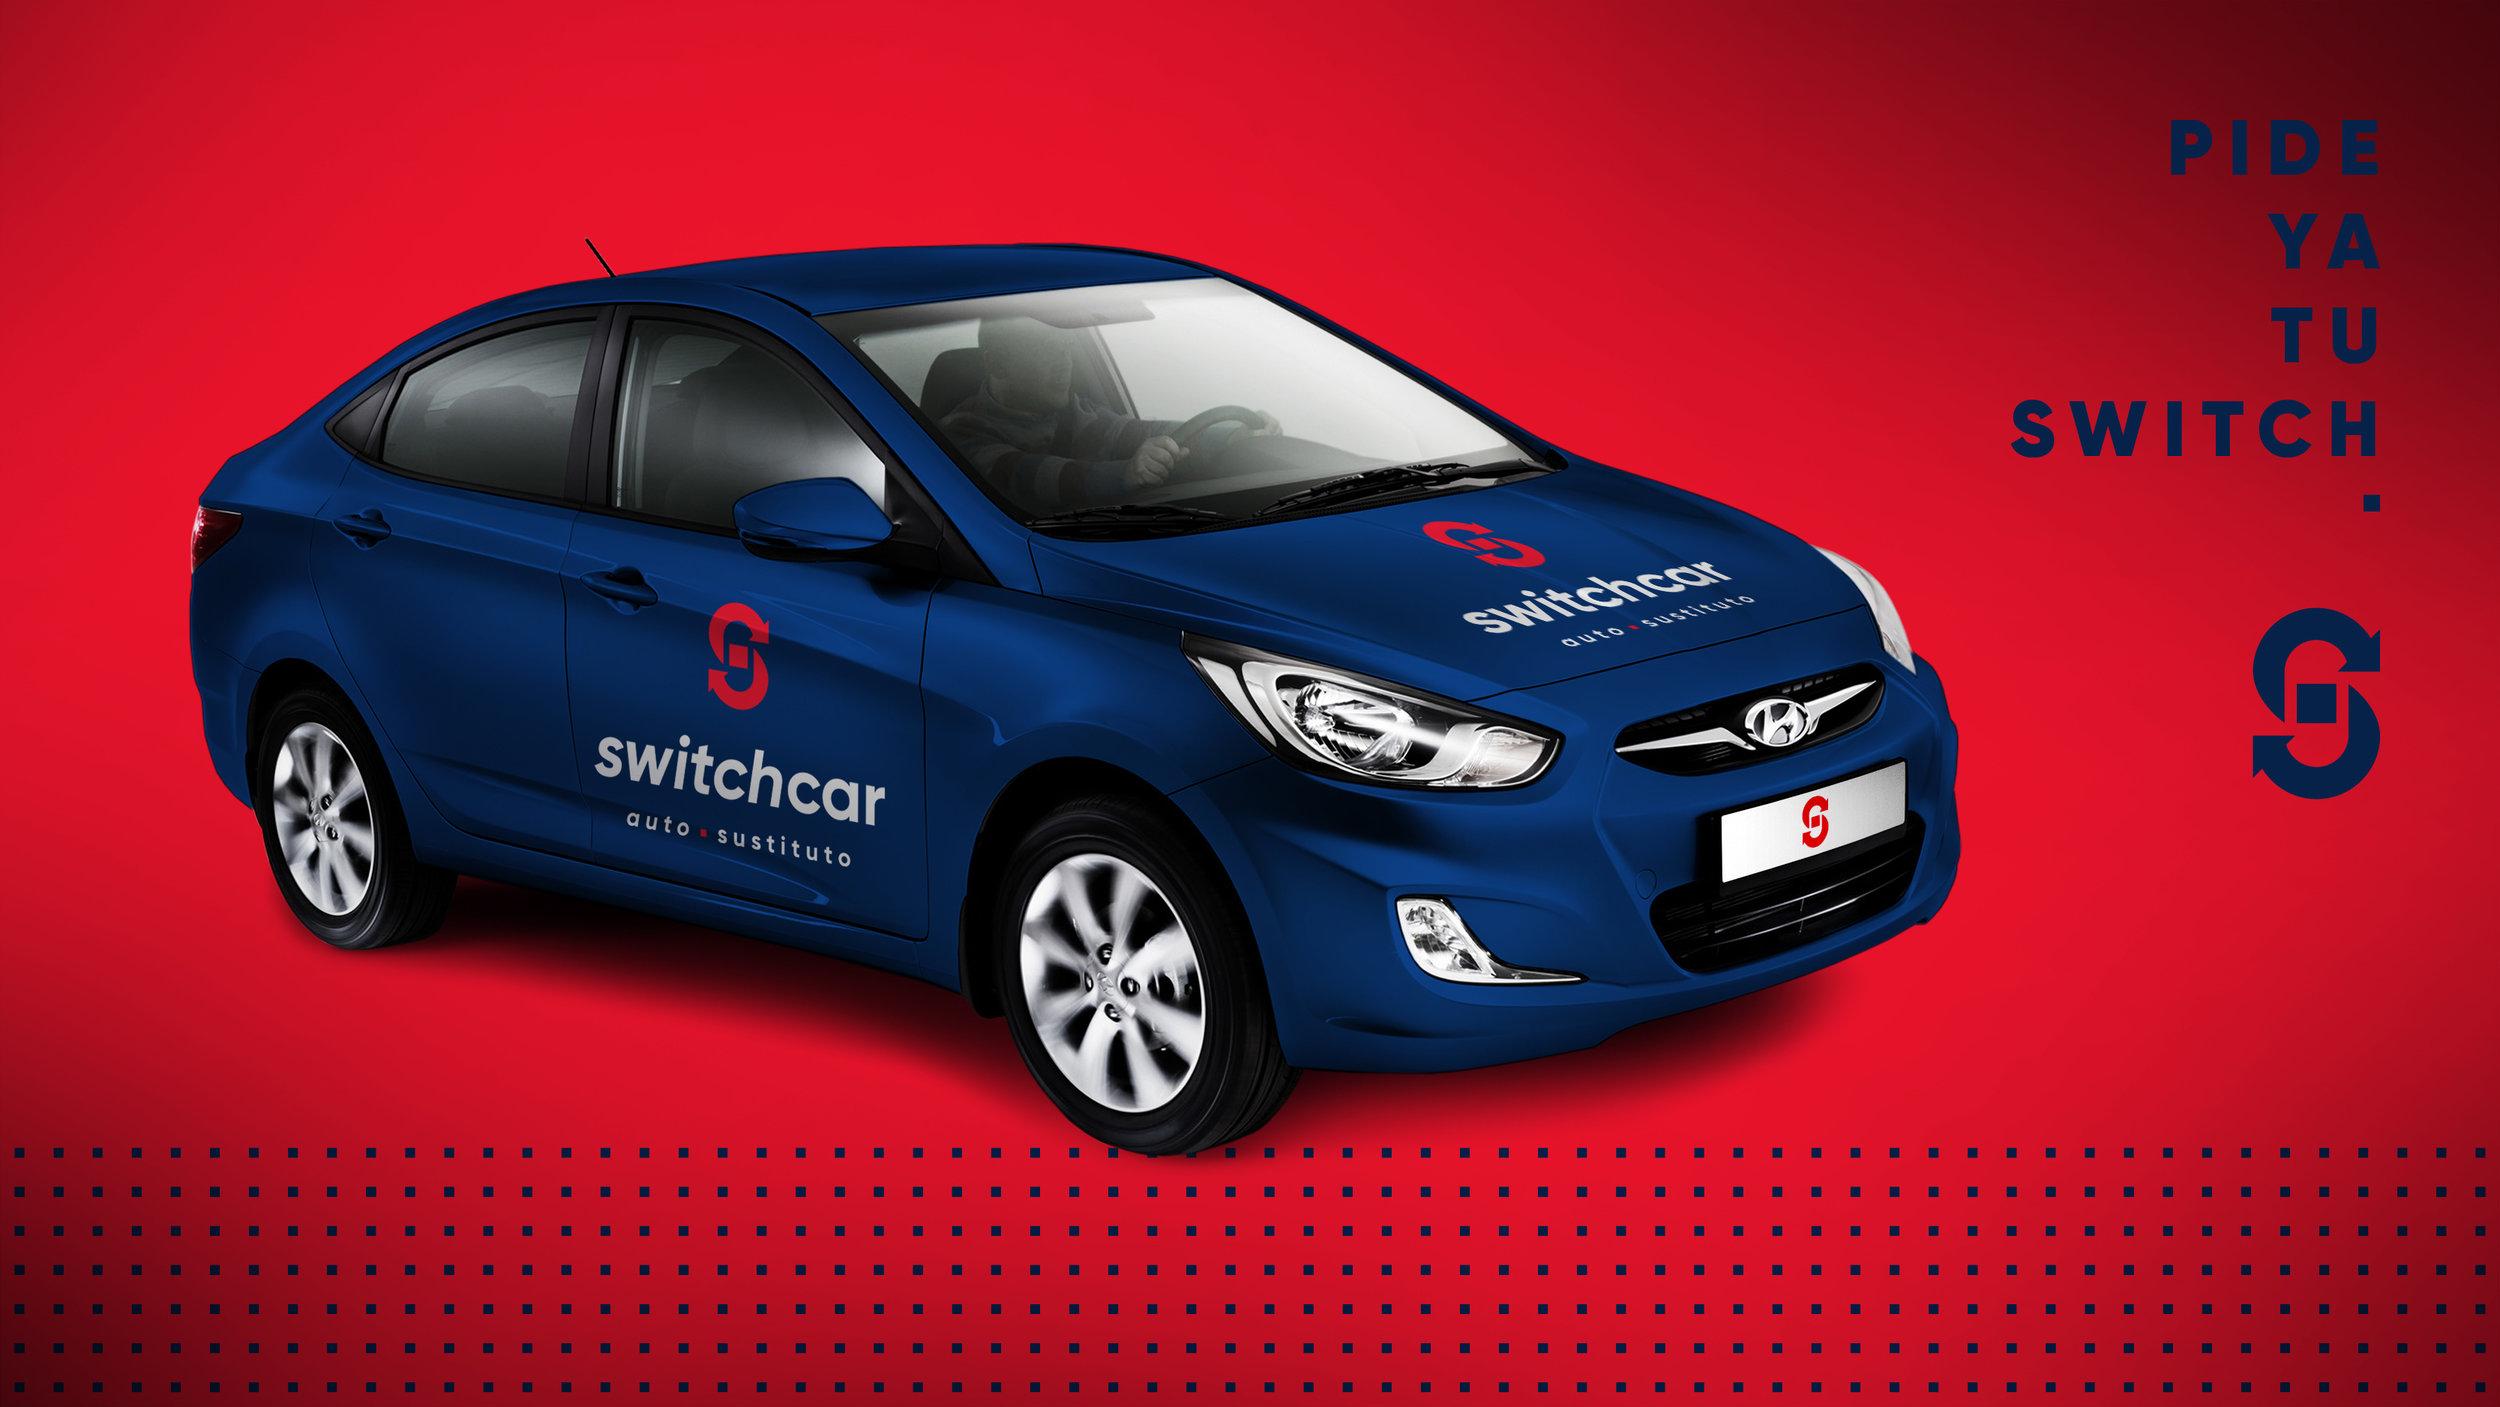 Switchcar - Presentación-12.jpg